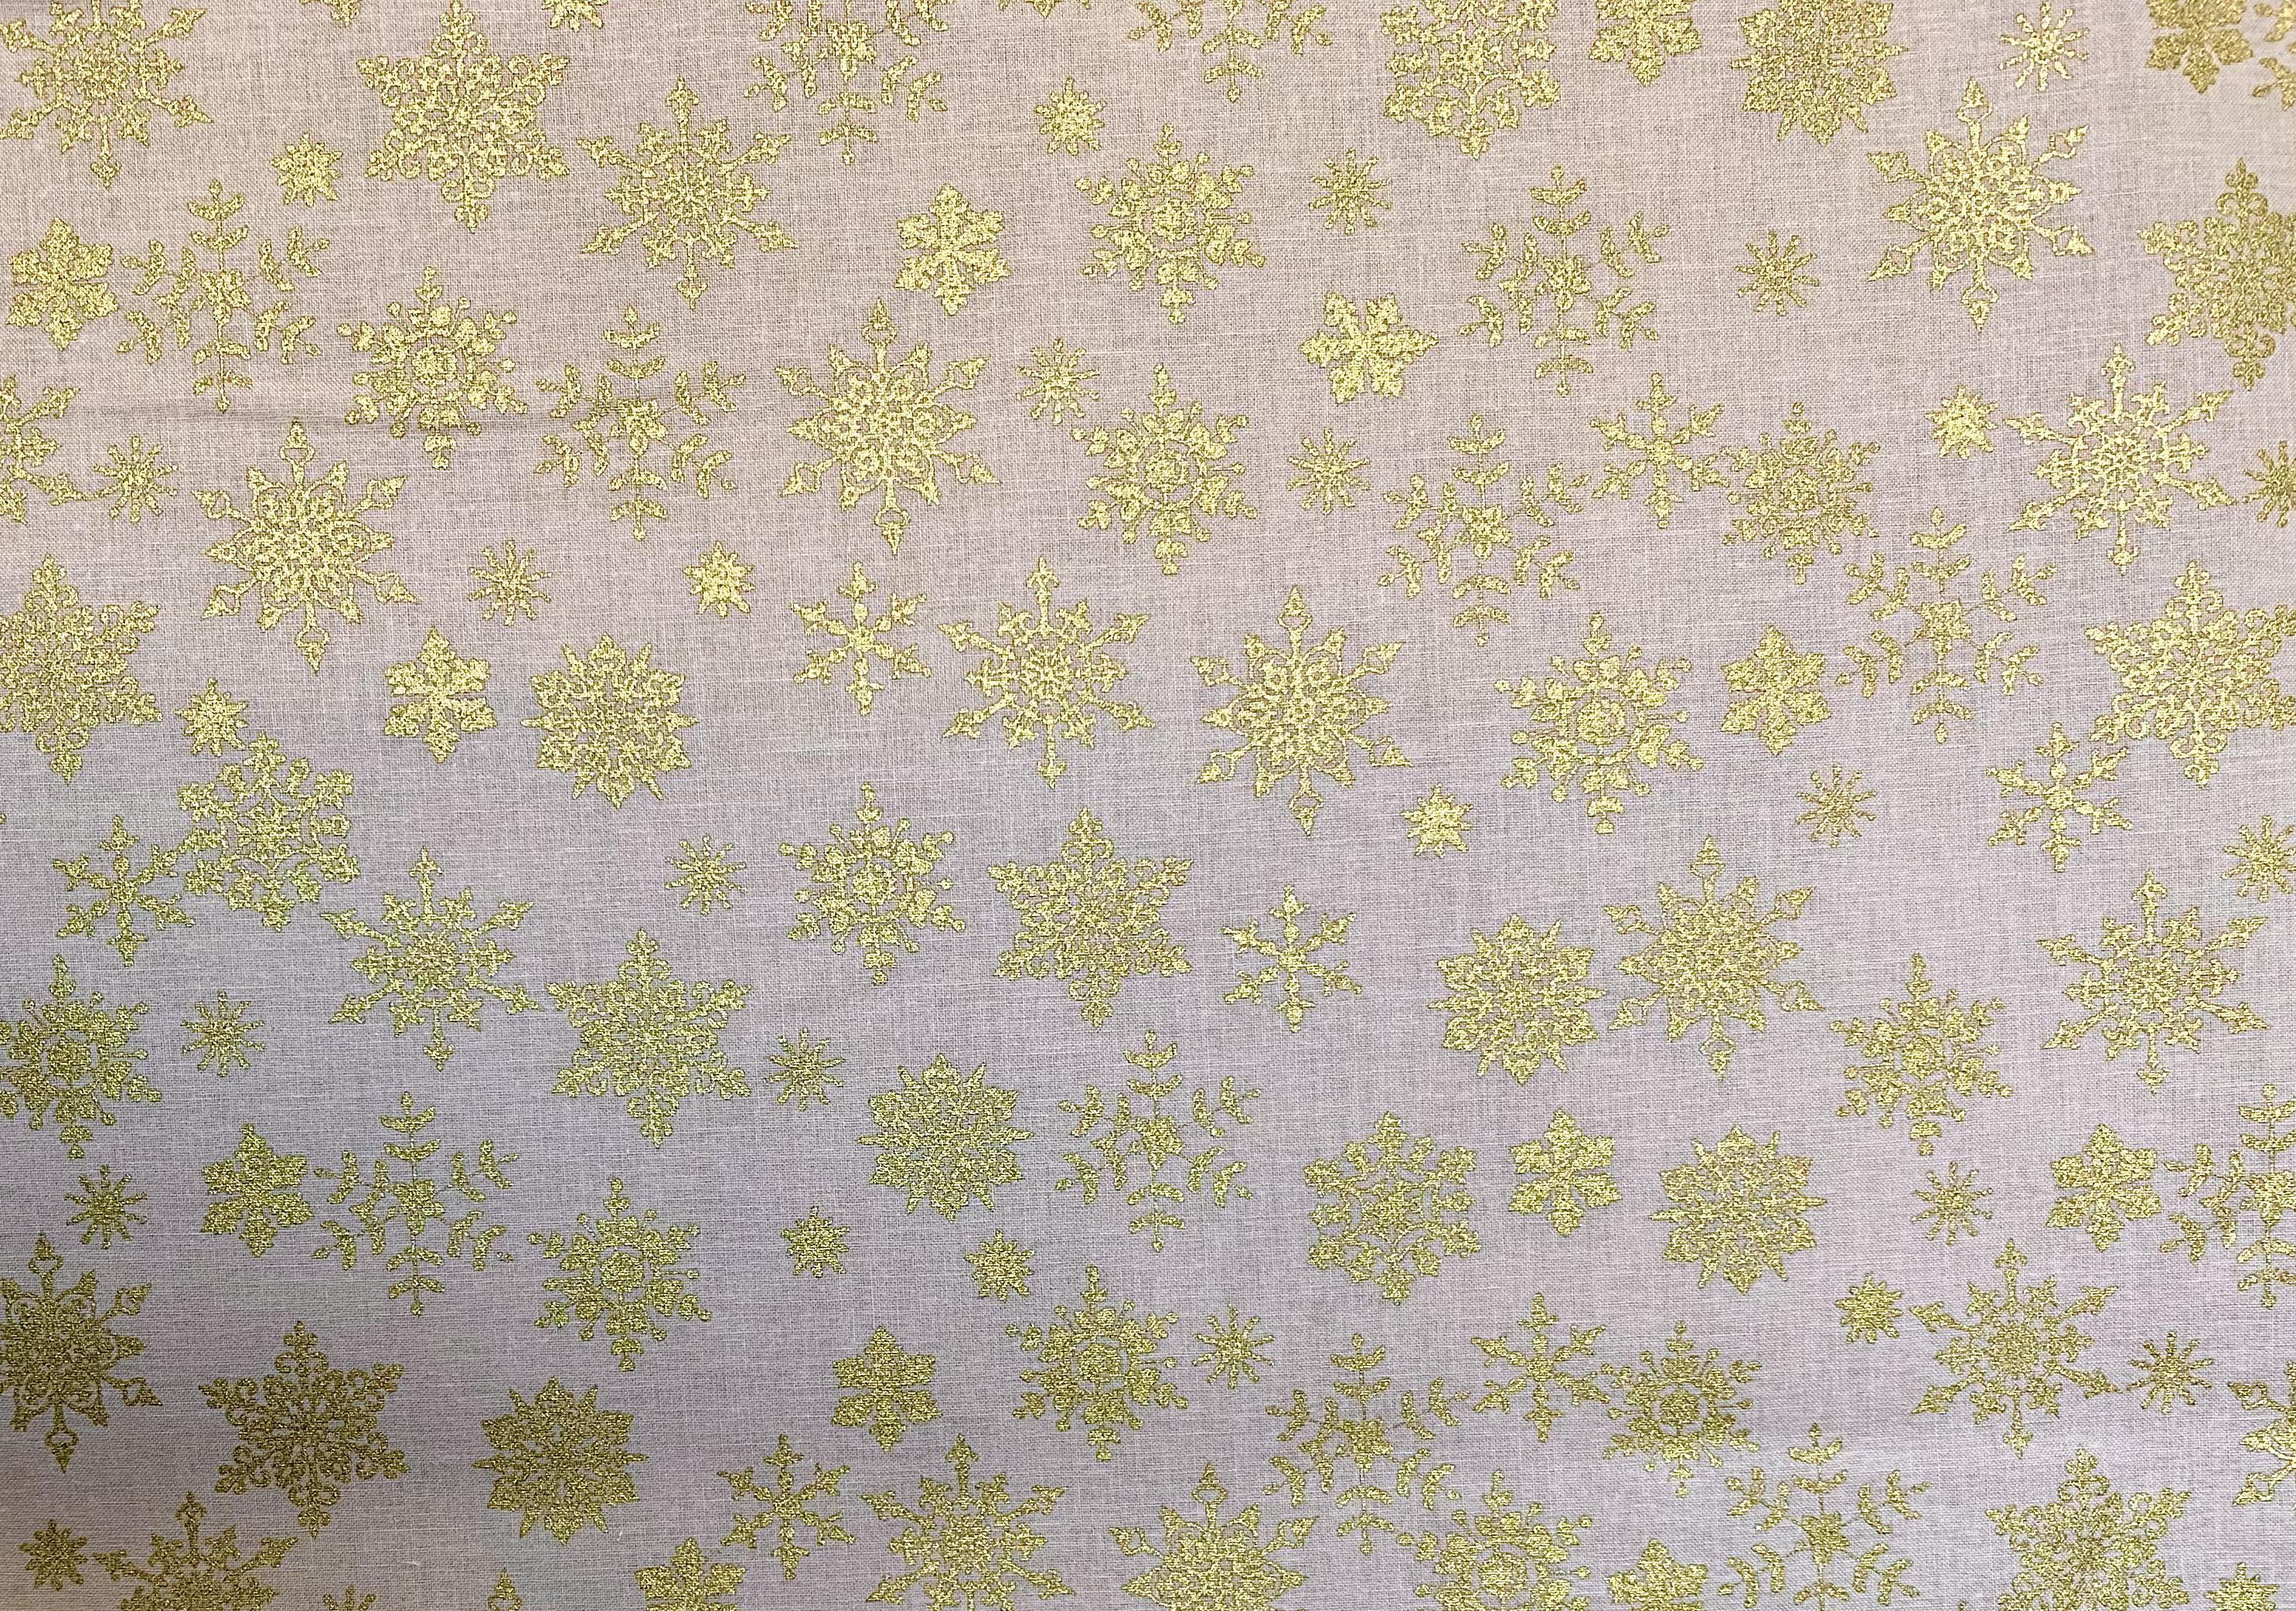 Gold Snowflakes on Tan - 1/2m cut 57721